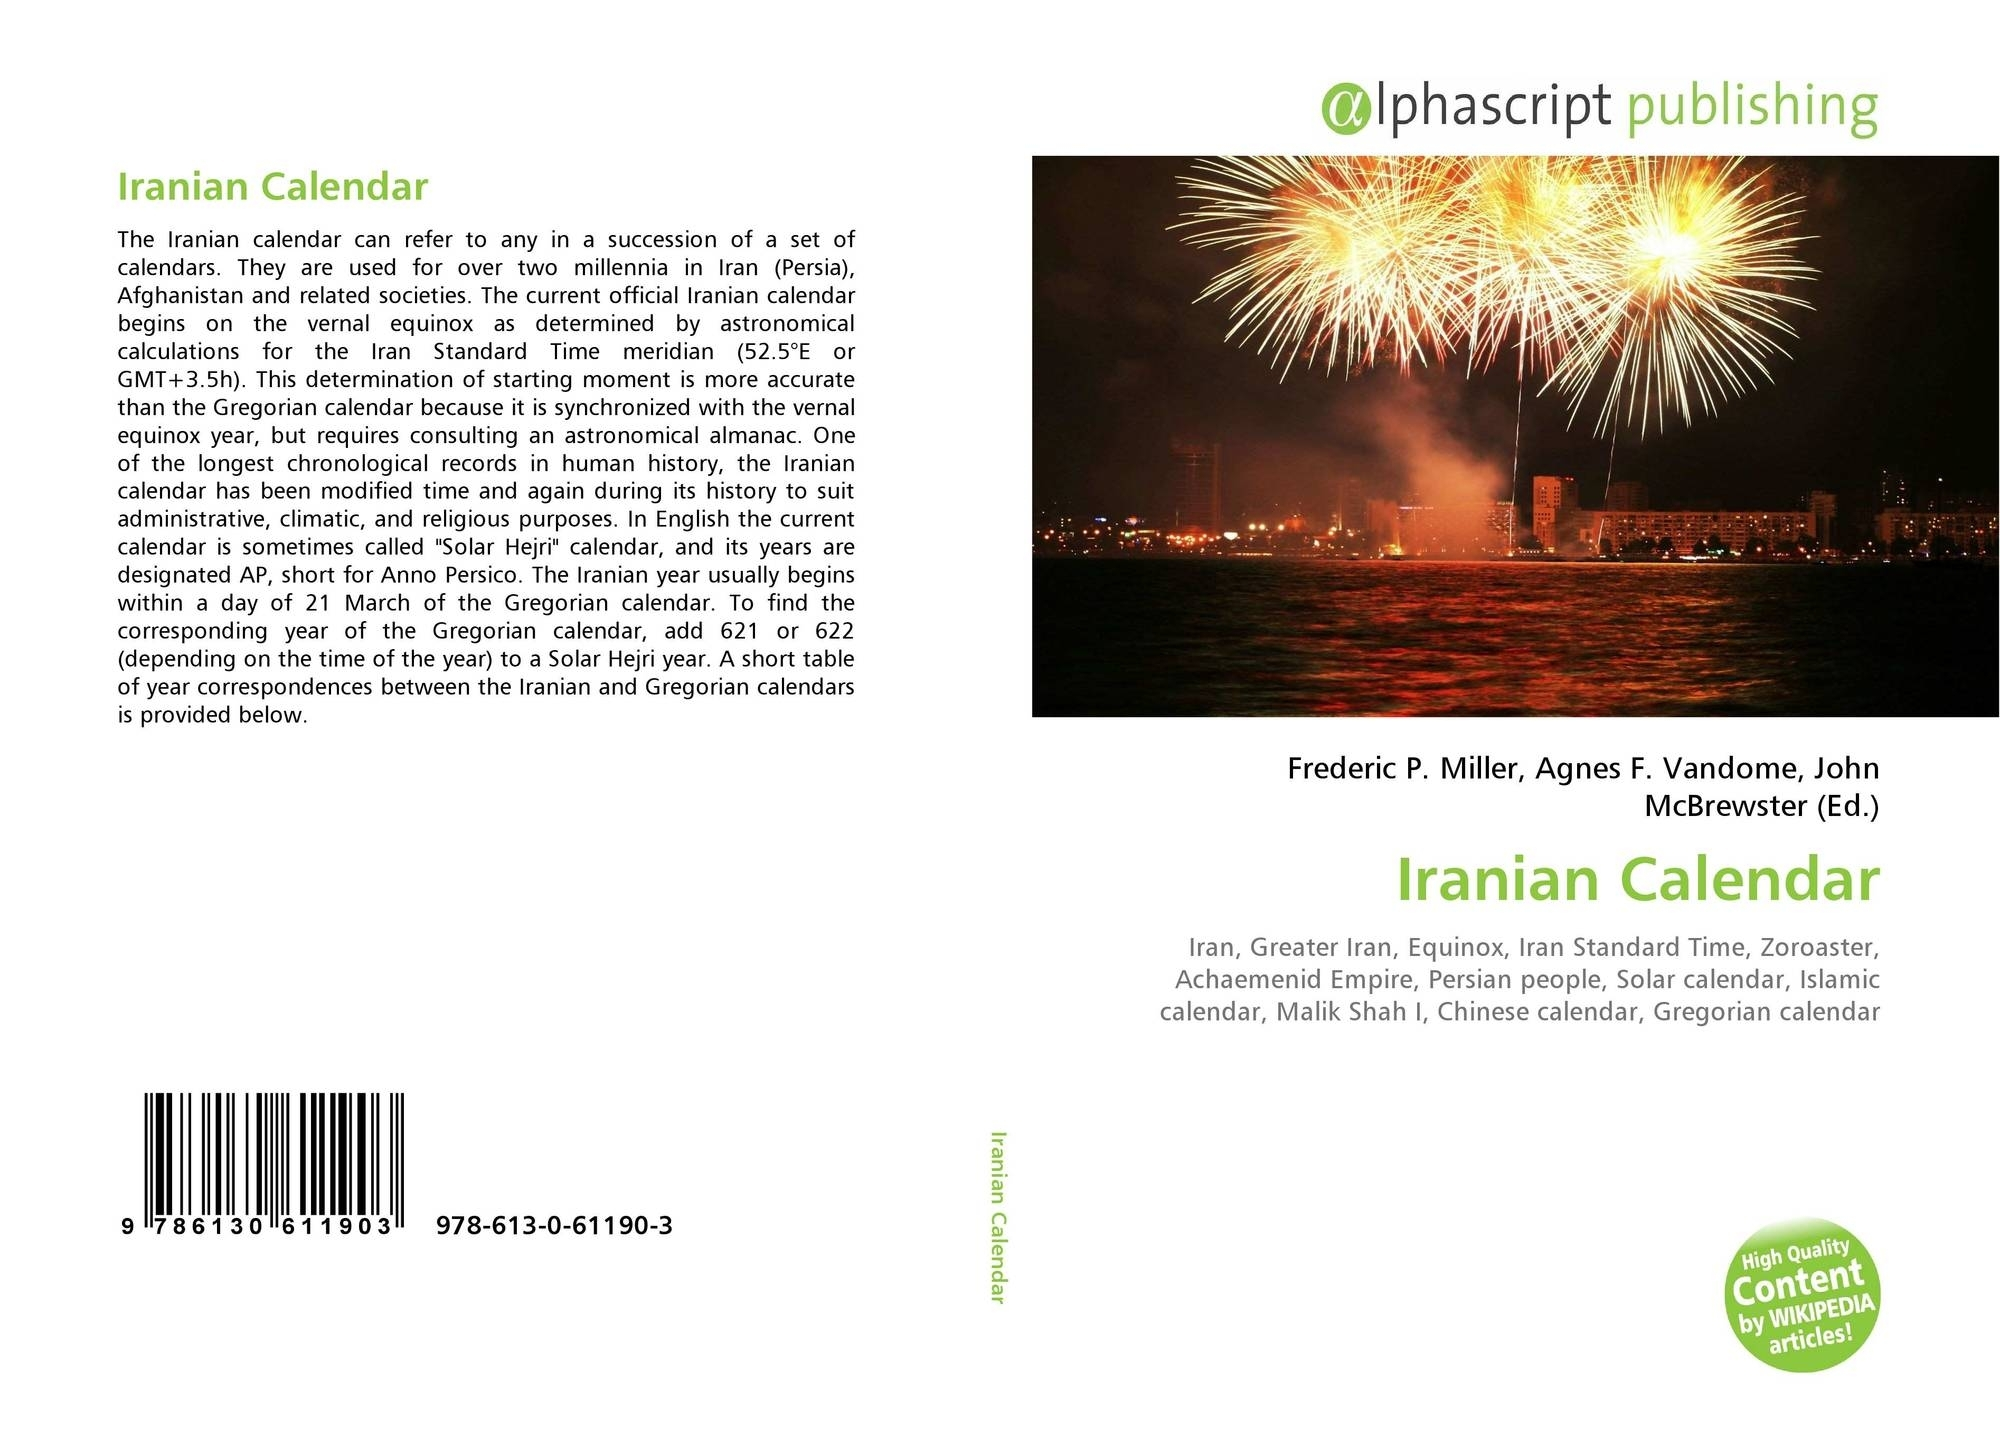 Iranian Calendar, 978-613-0-61190-3, 6130611900 ,9786130611903